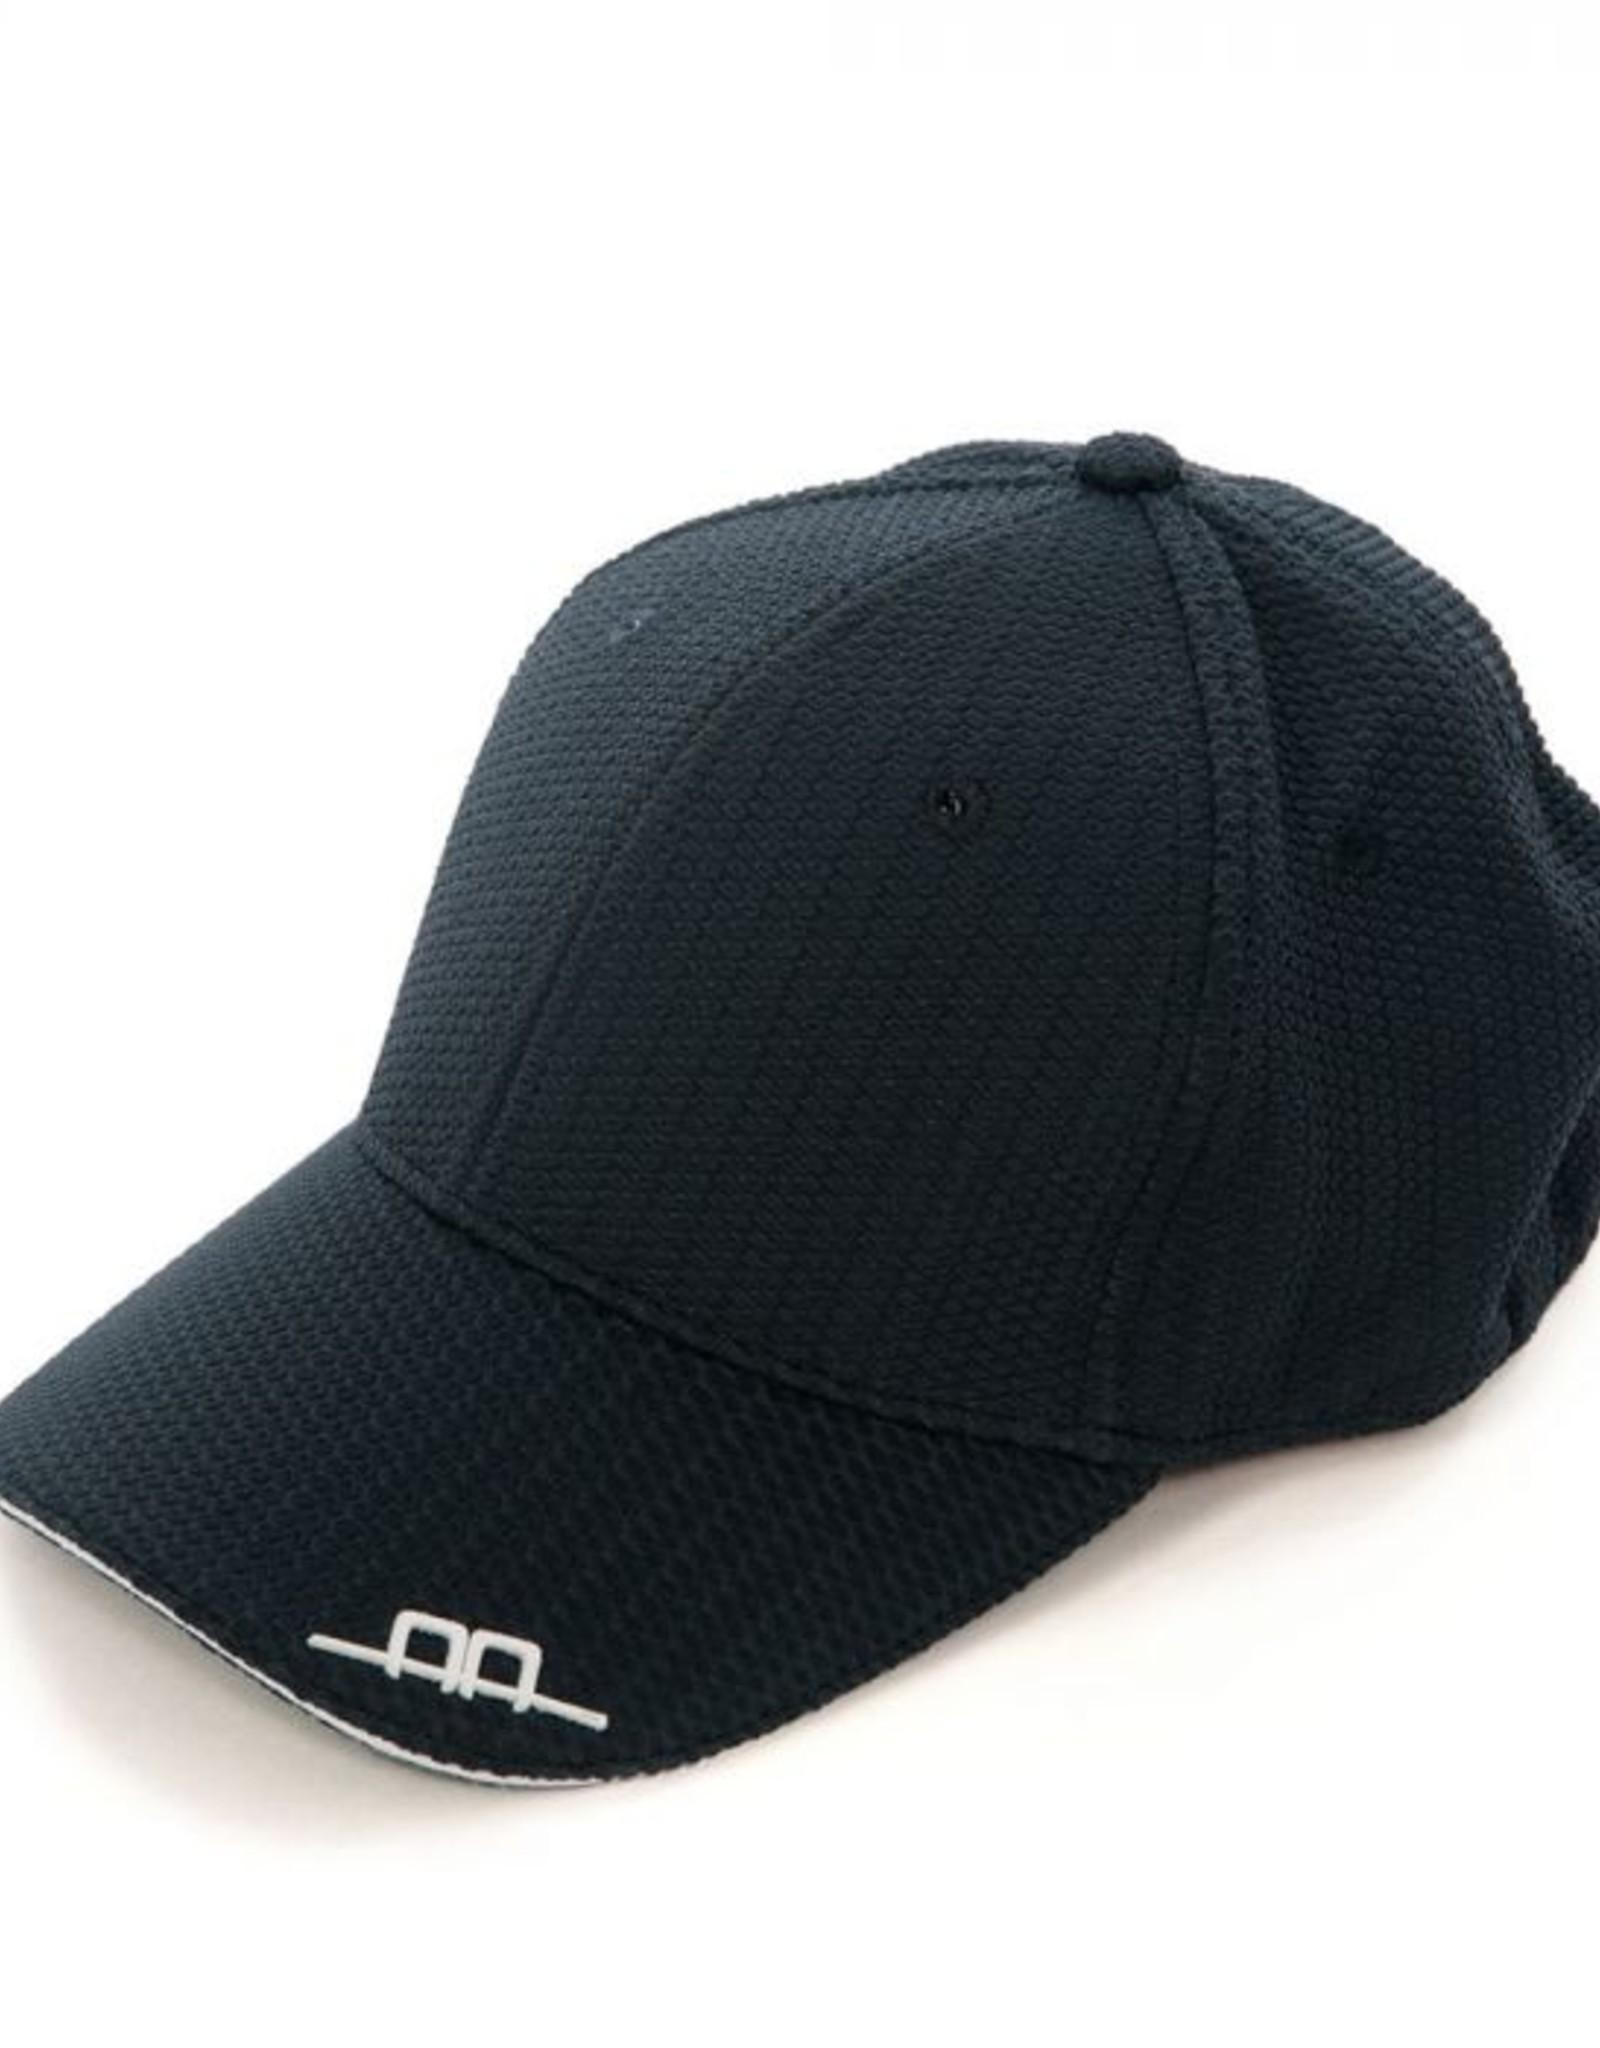 ALESSANDRO ALBANESE MOTIONLIGHT CAP